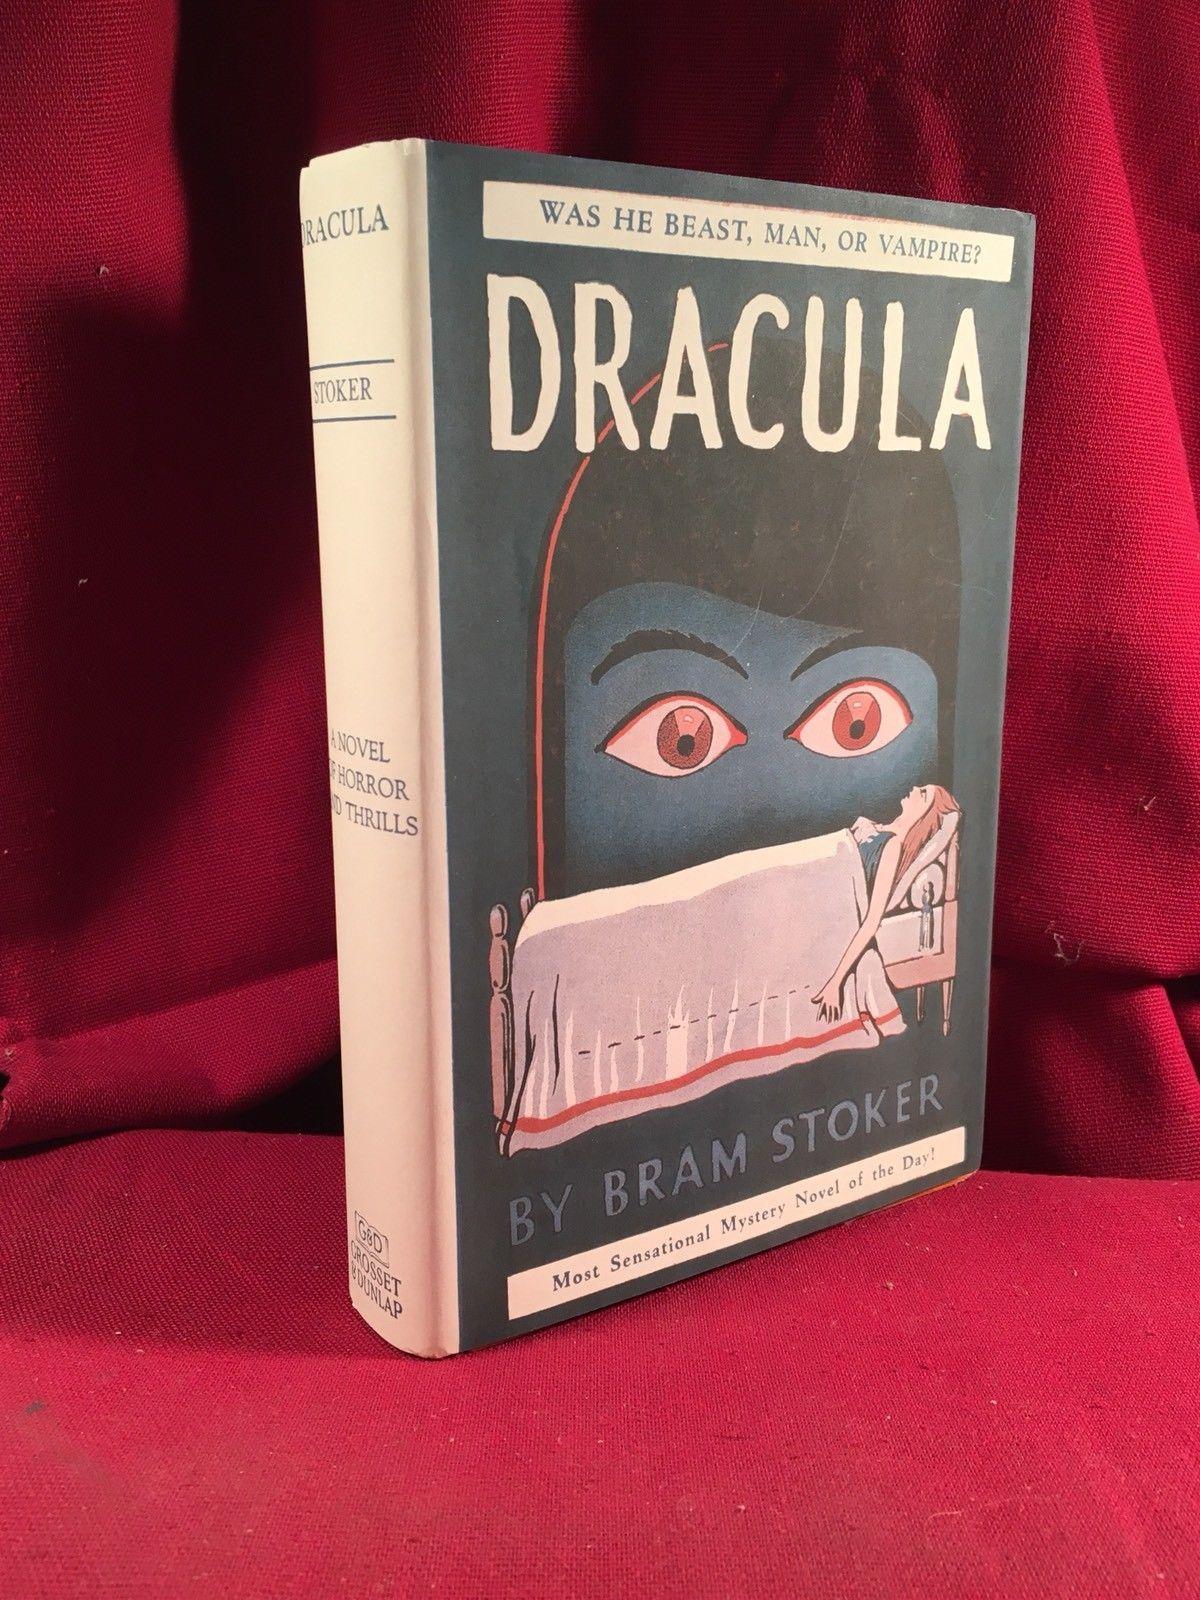 Dracula by Bram Stoker older hardback edition